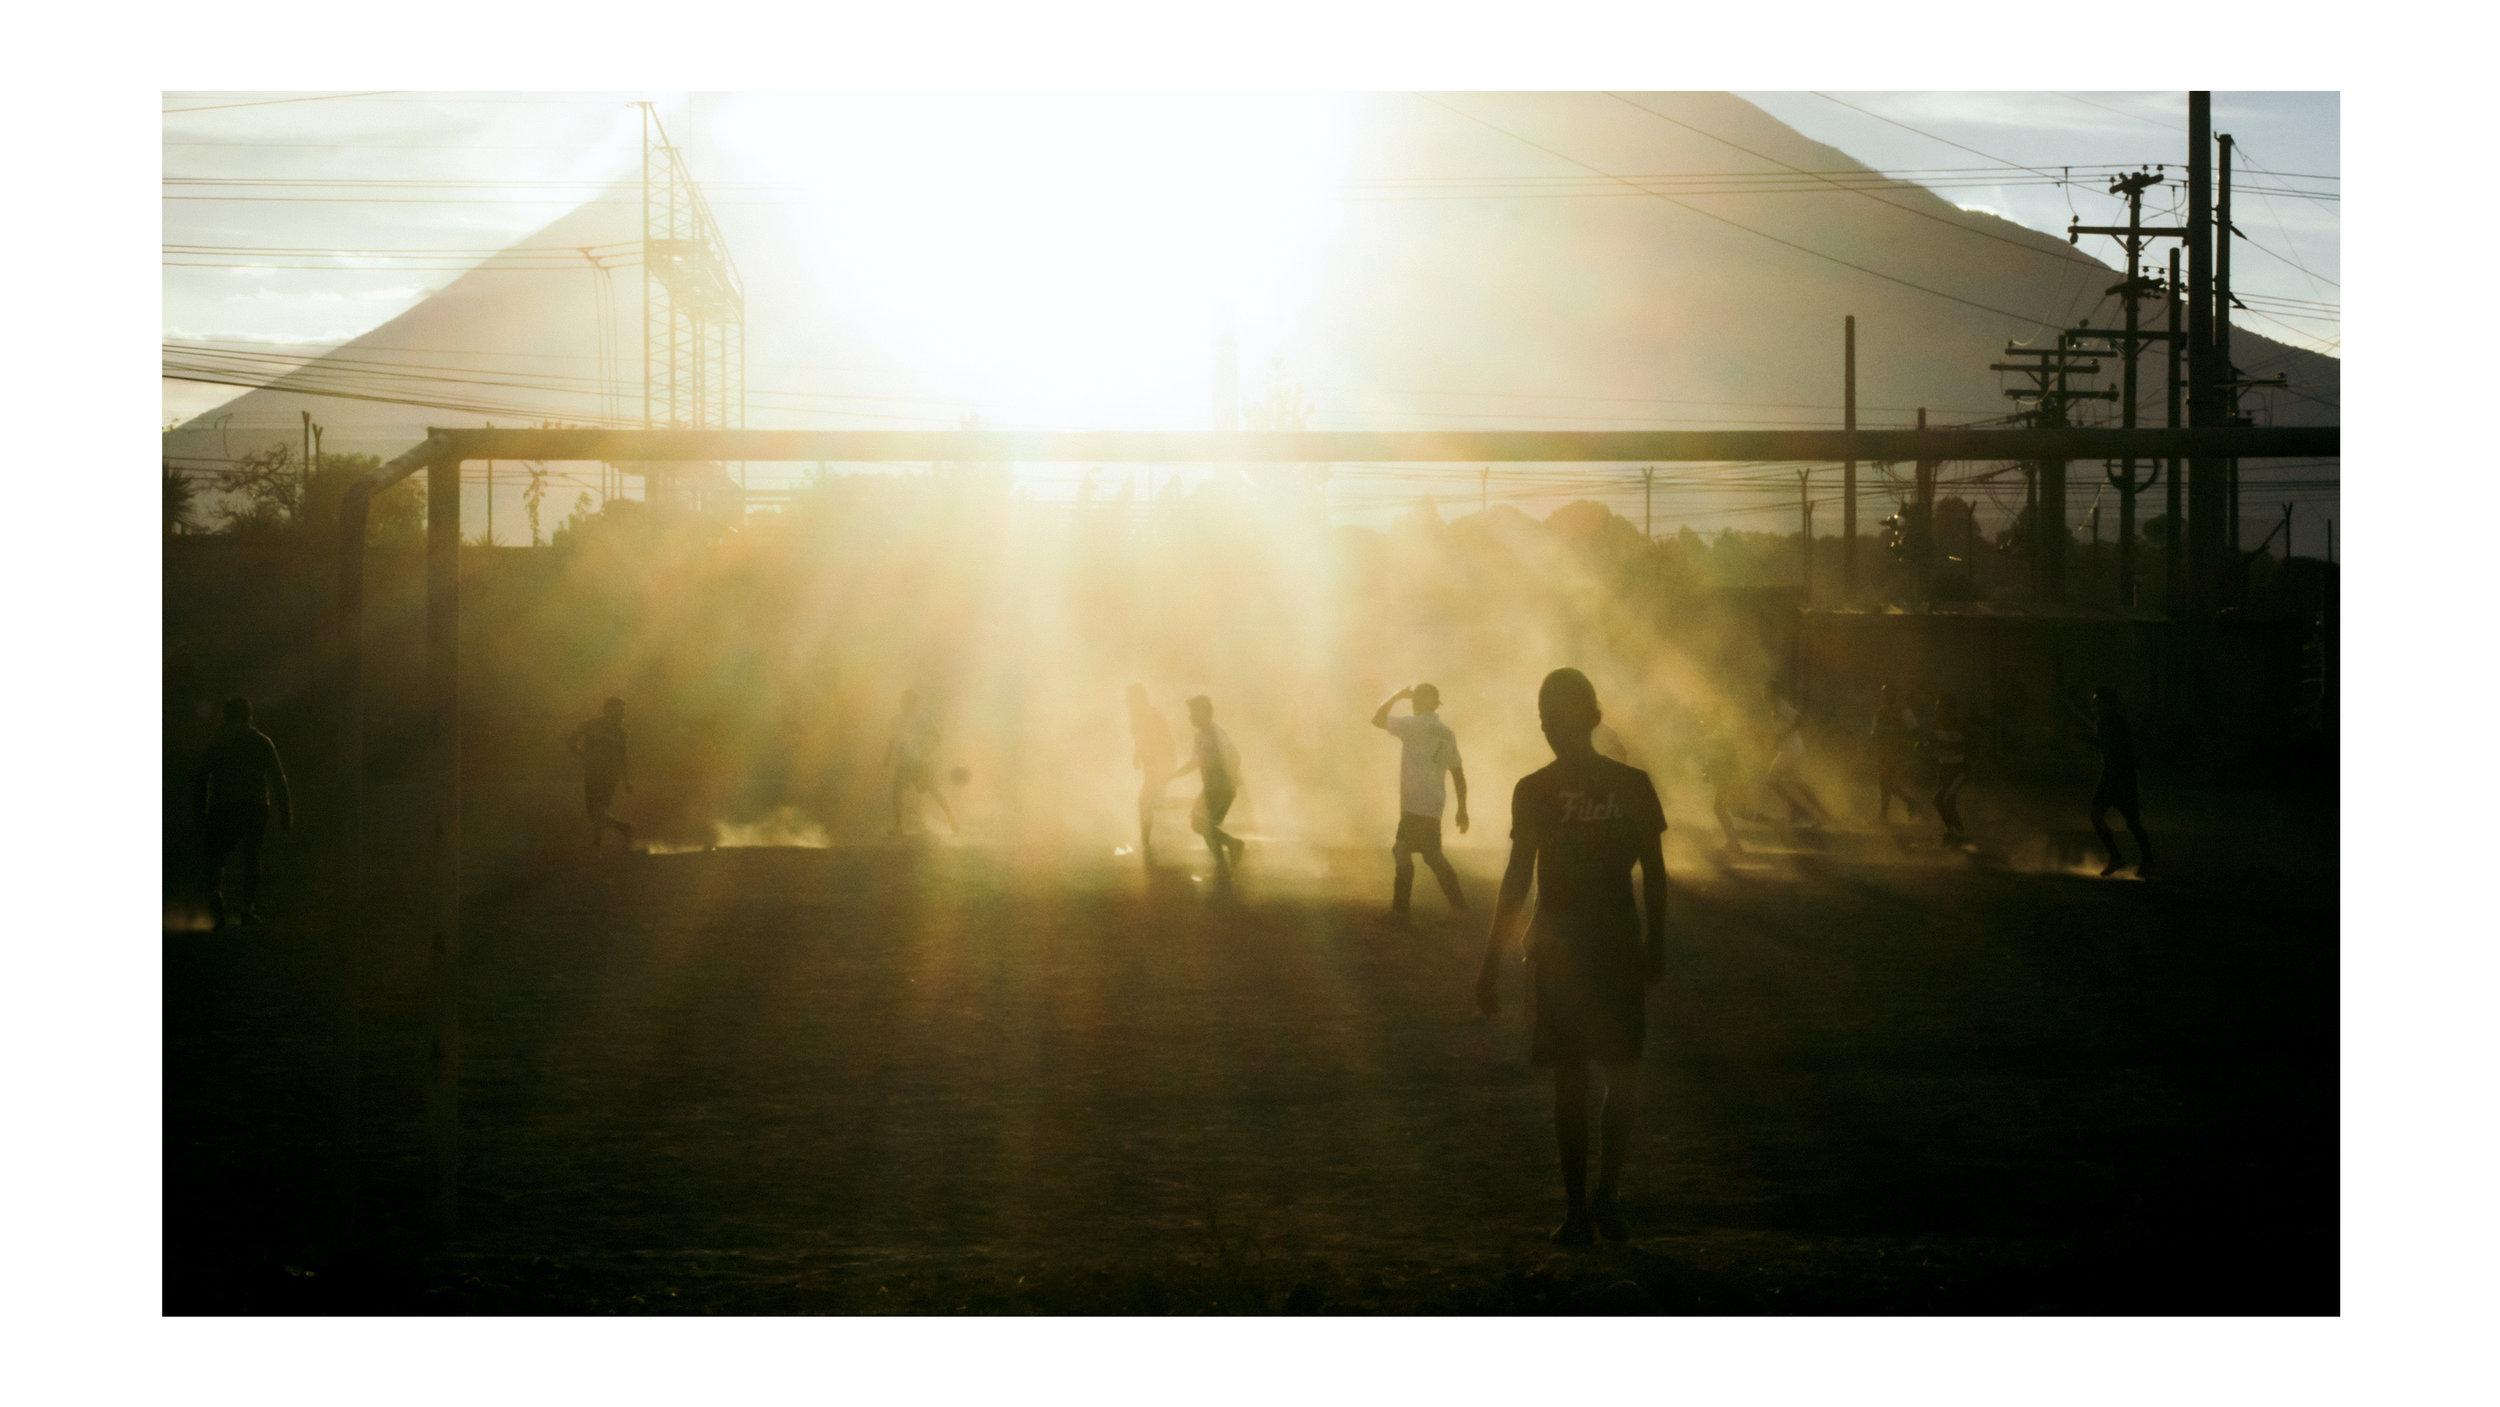 Dusty  futbol  match, magic hour is magic